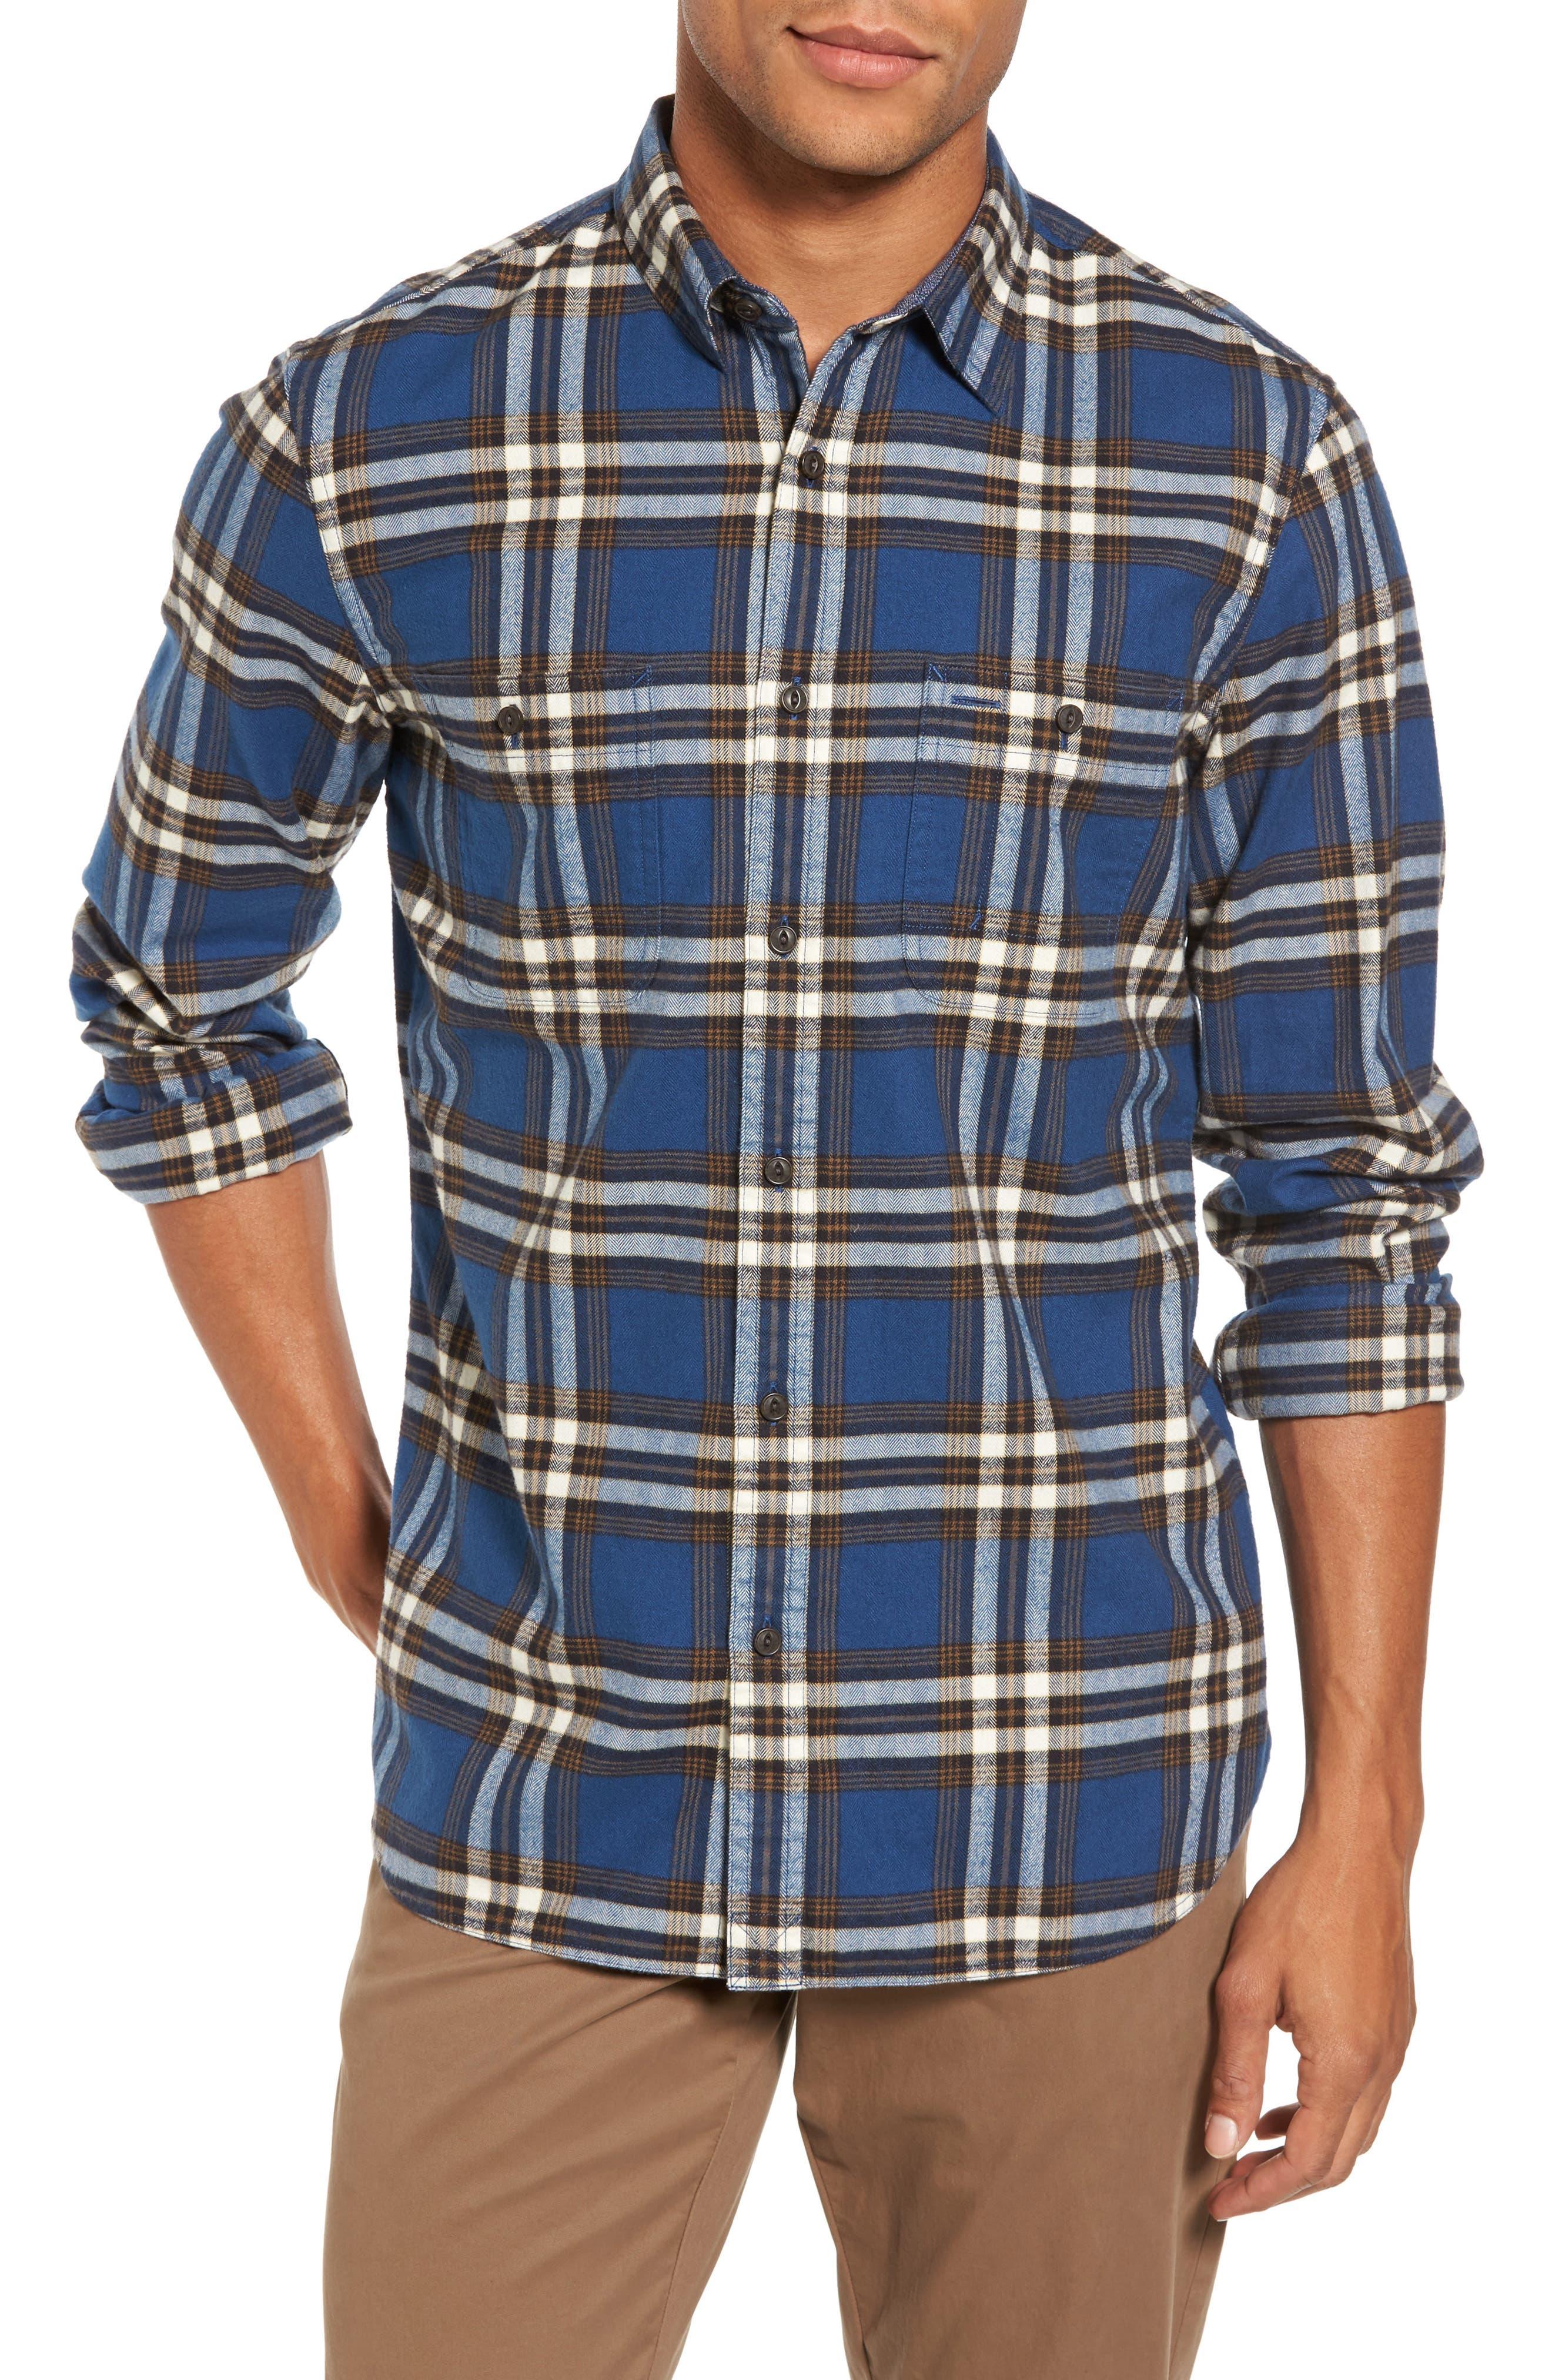 Alternate Image 1 Selected - Nordstrom Men's Shop Trim Fit Workwear Check Flannel Shirt